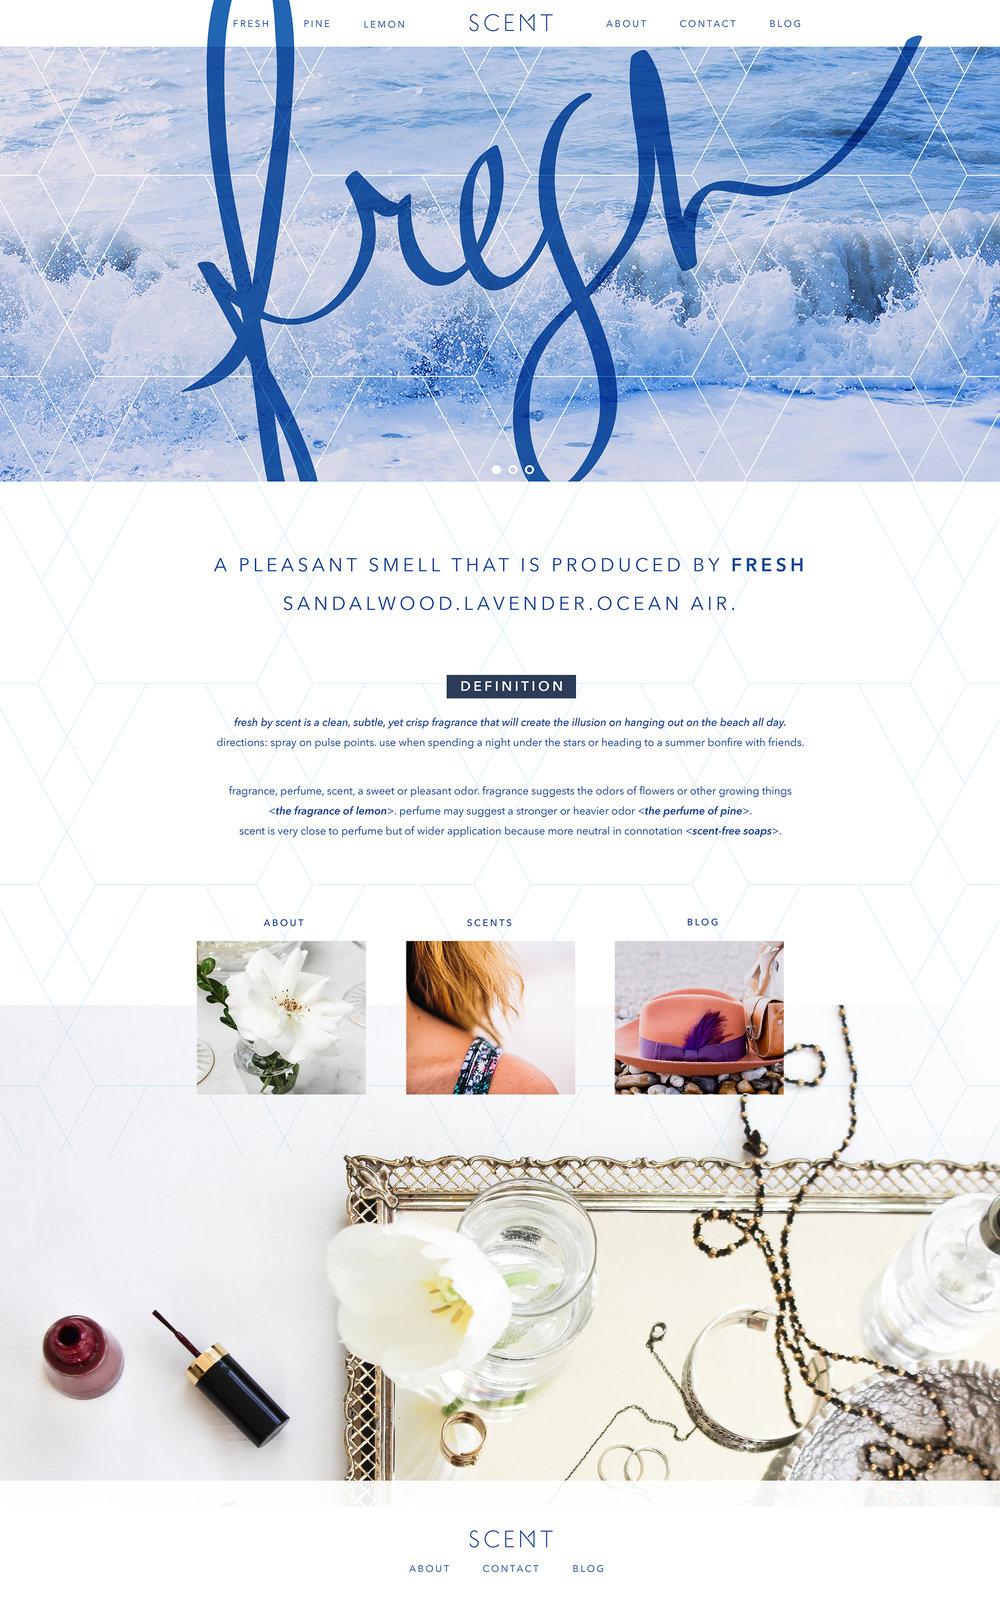 scent-index-page.jpg